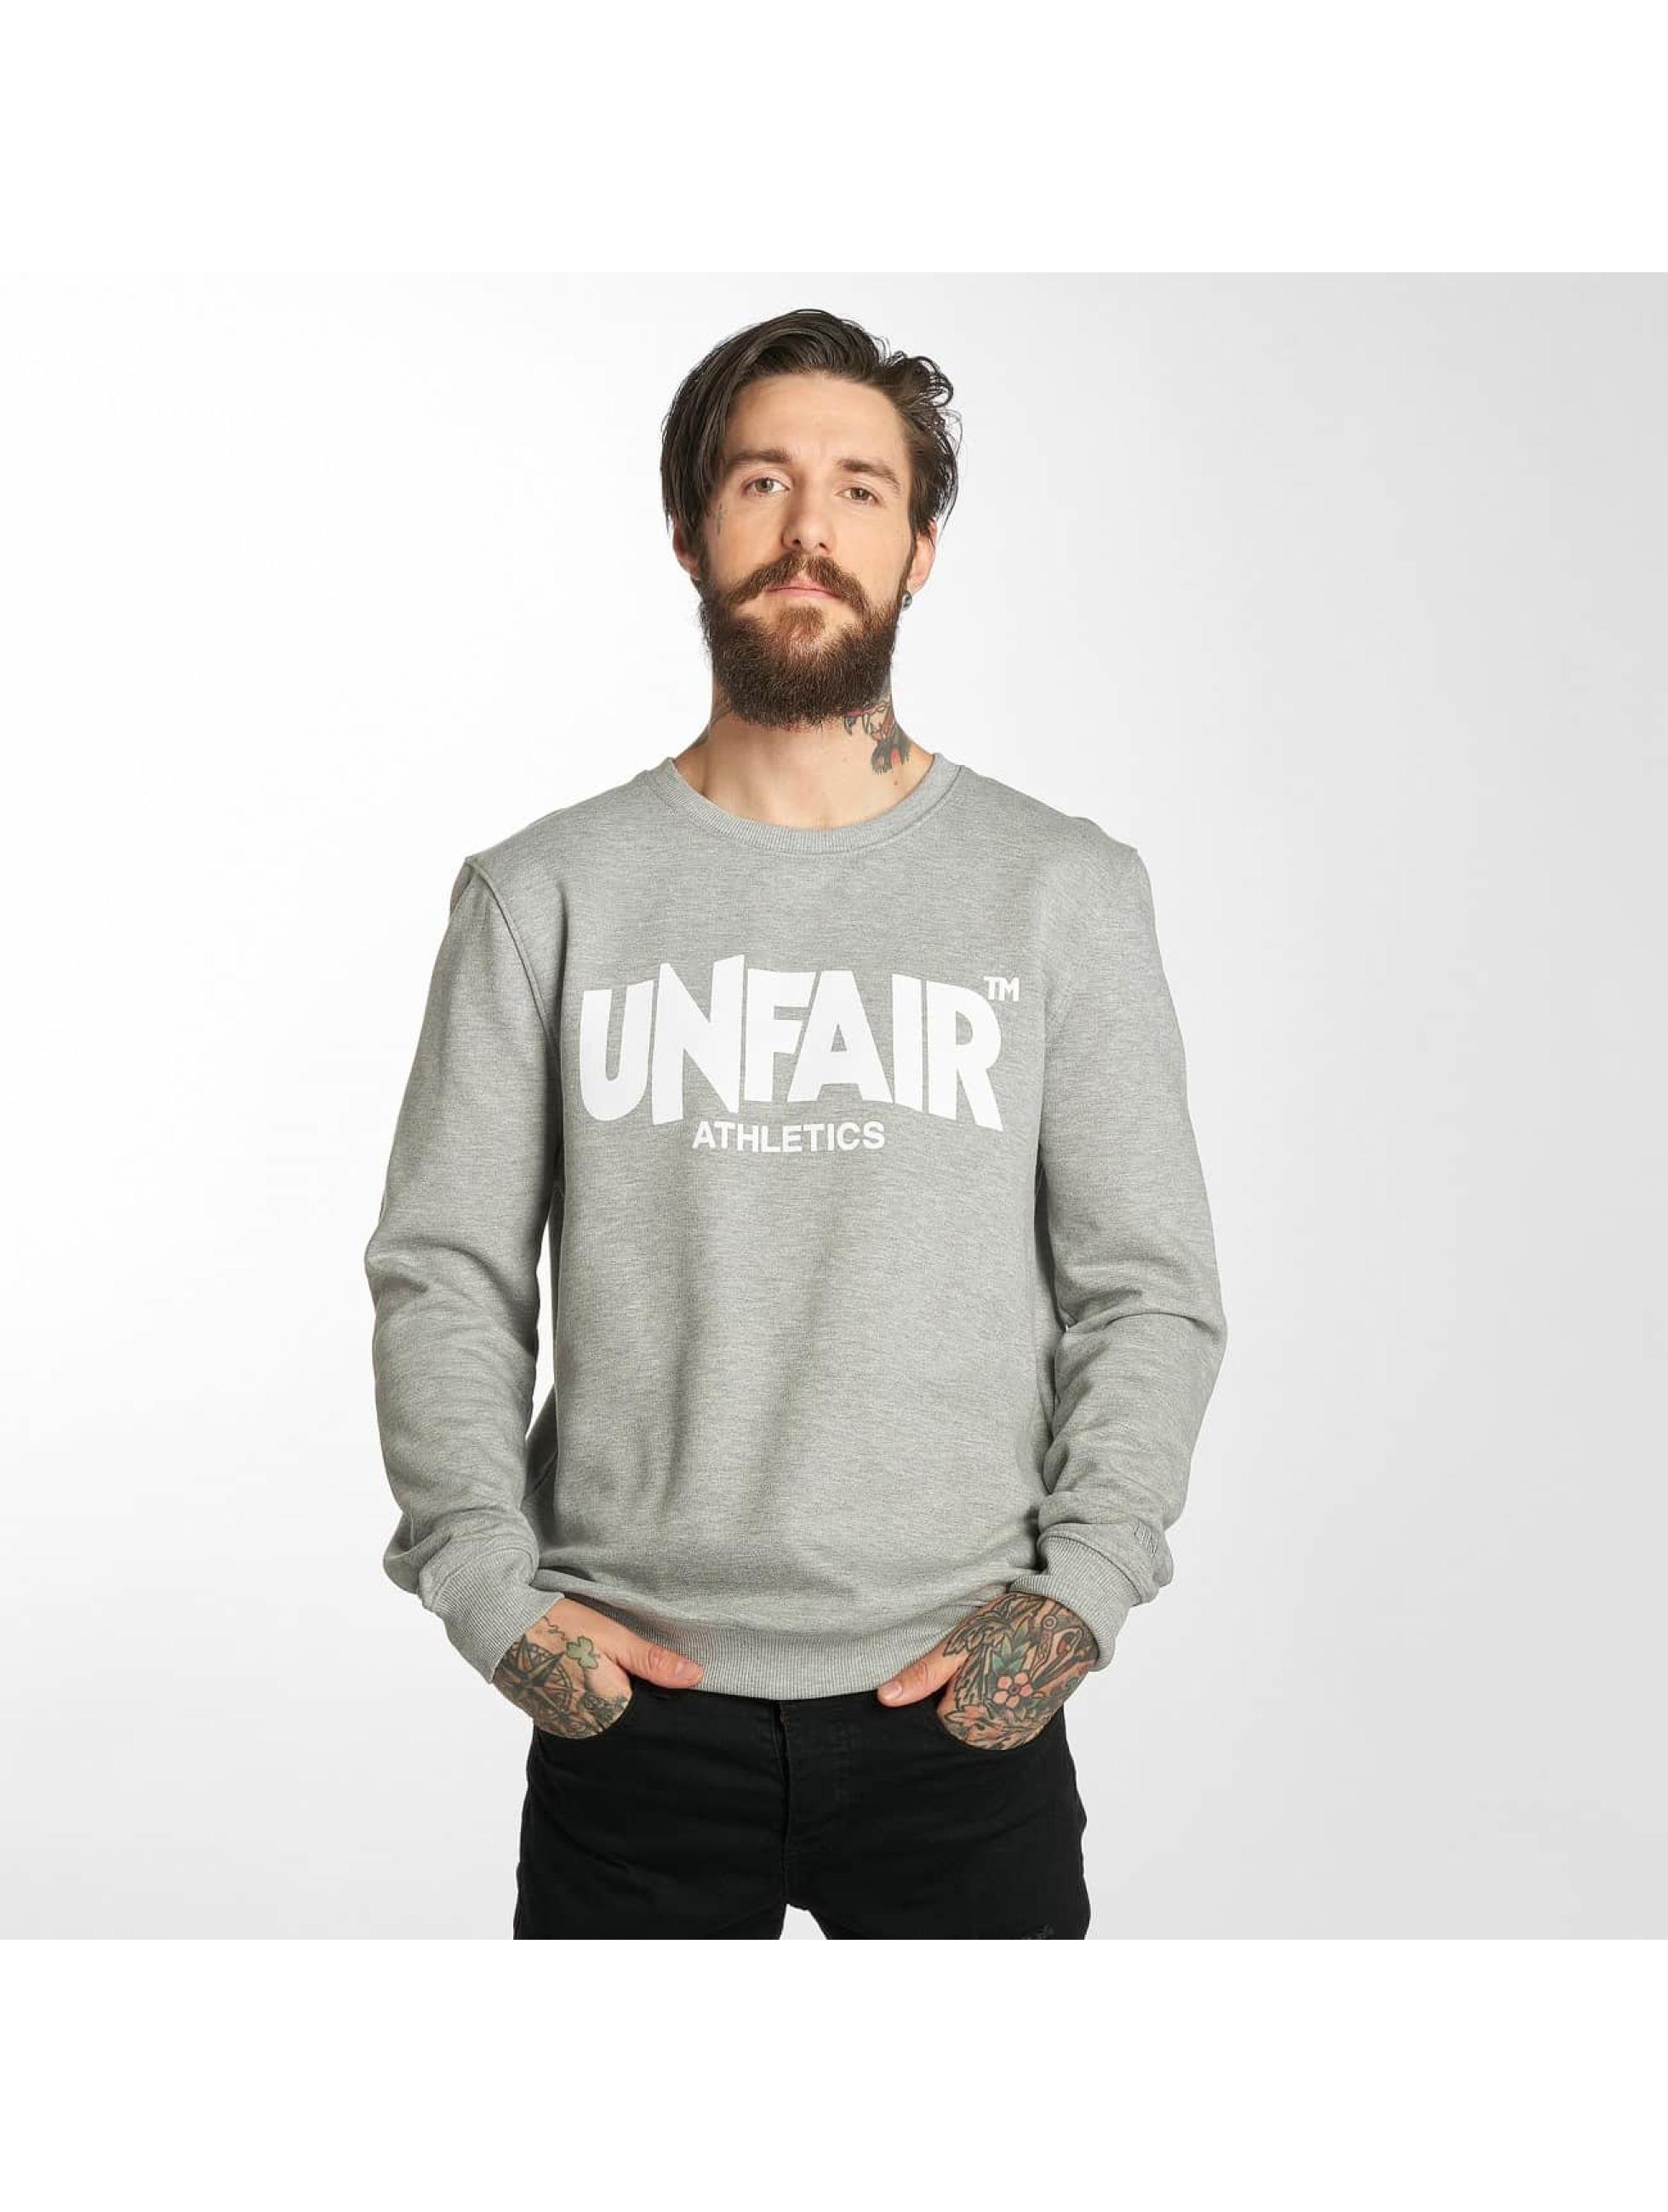 UNFAIR ATHLETICS Gensre Classic grå